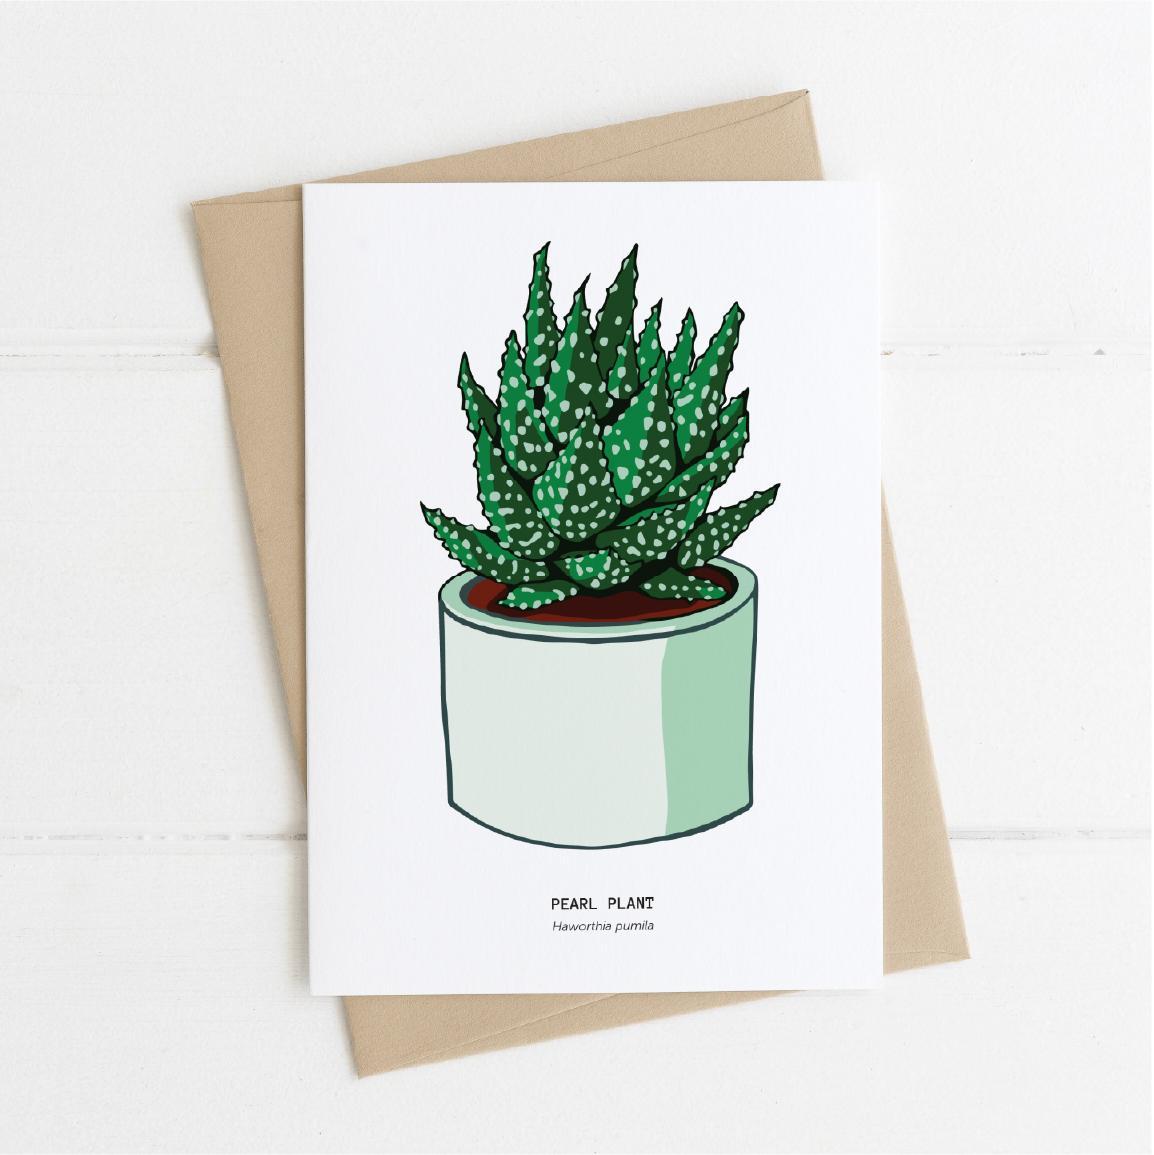 Pearl Plant A7 card